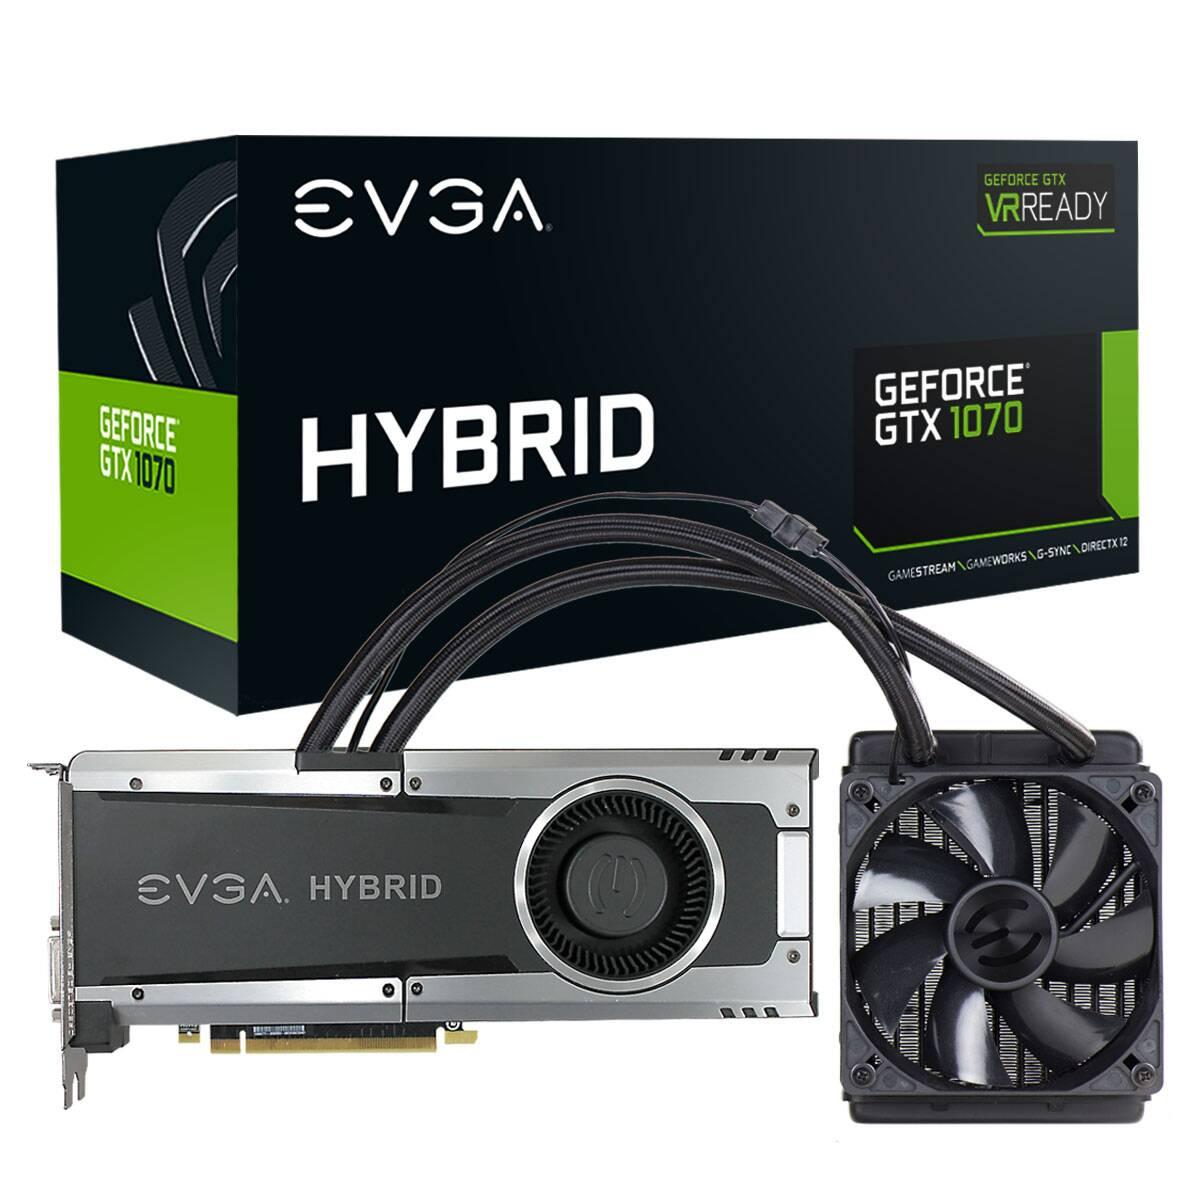 Placa Video EVGA GeForce GTX 1070 Gaming 8GB GDDR5 256 biti Hybrid